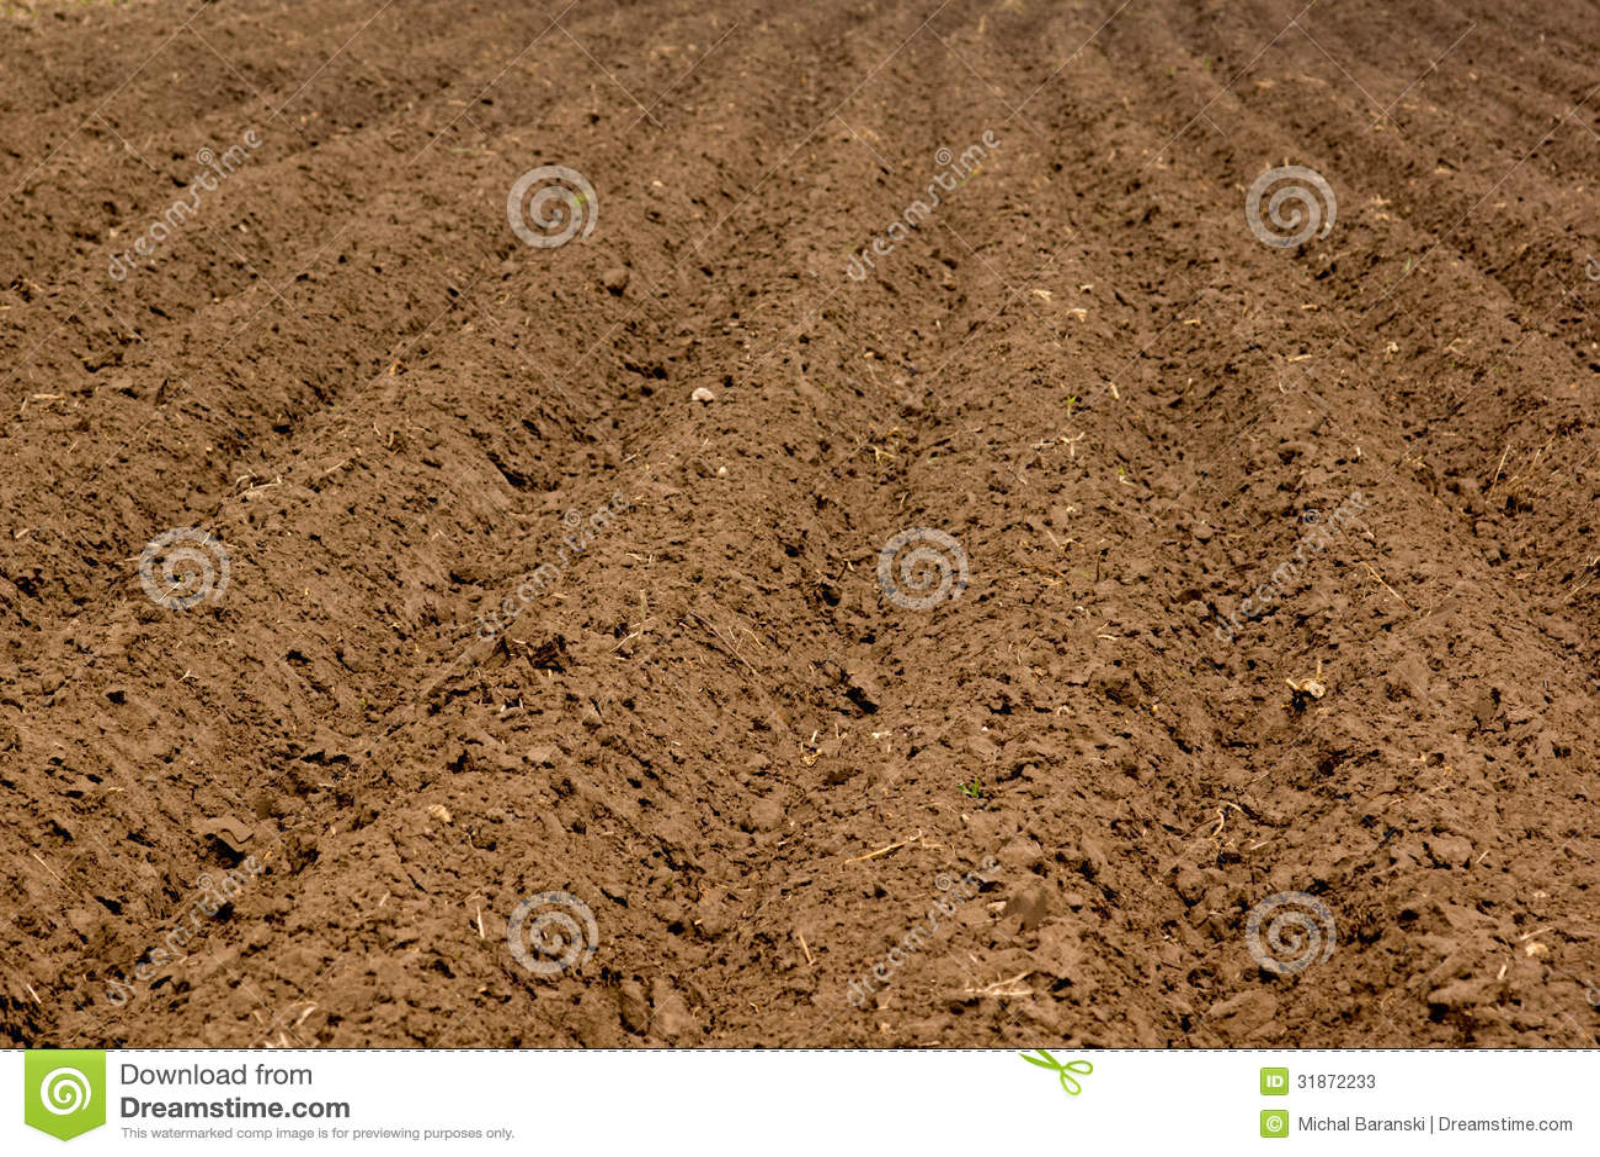 Soil stock photos image 31872233 for The soil 02joy